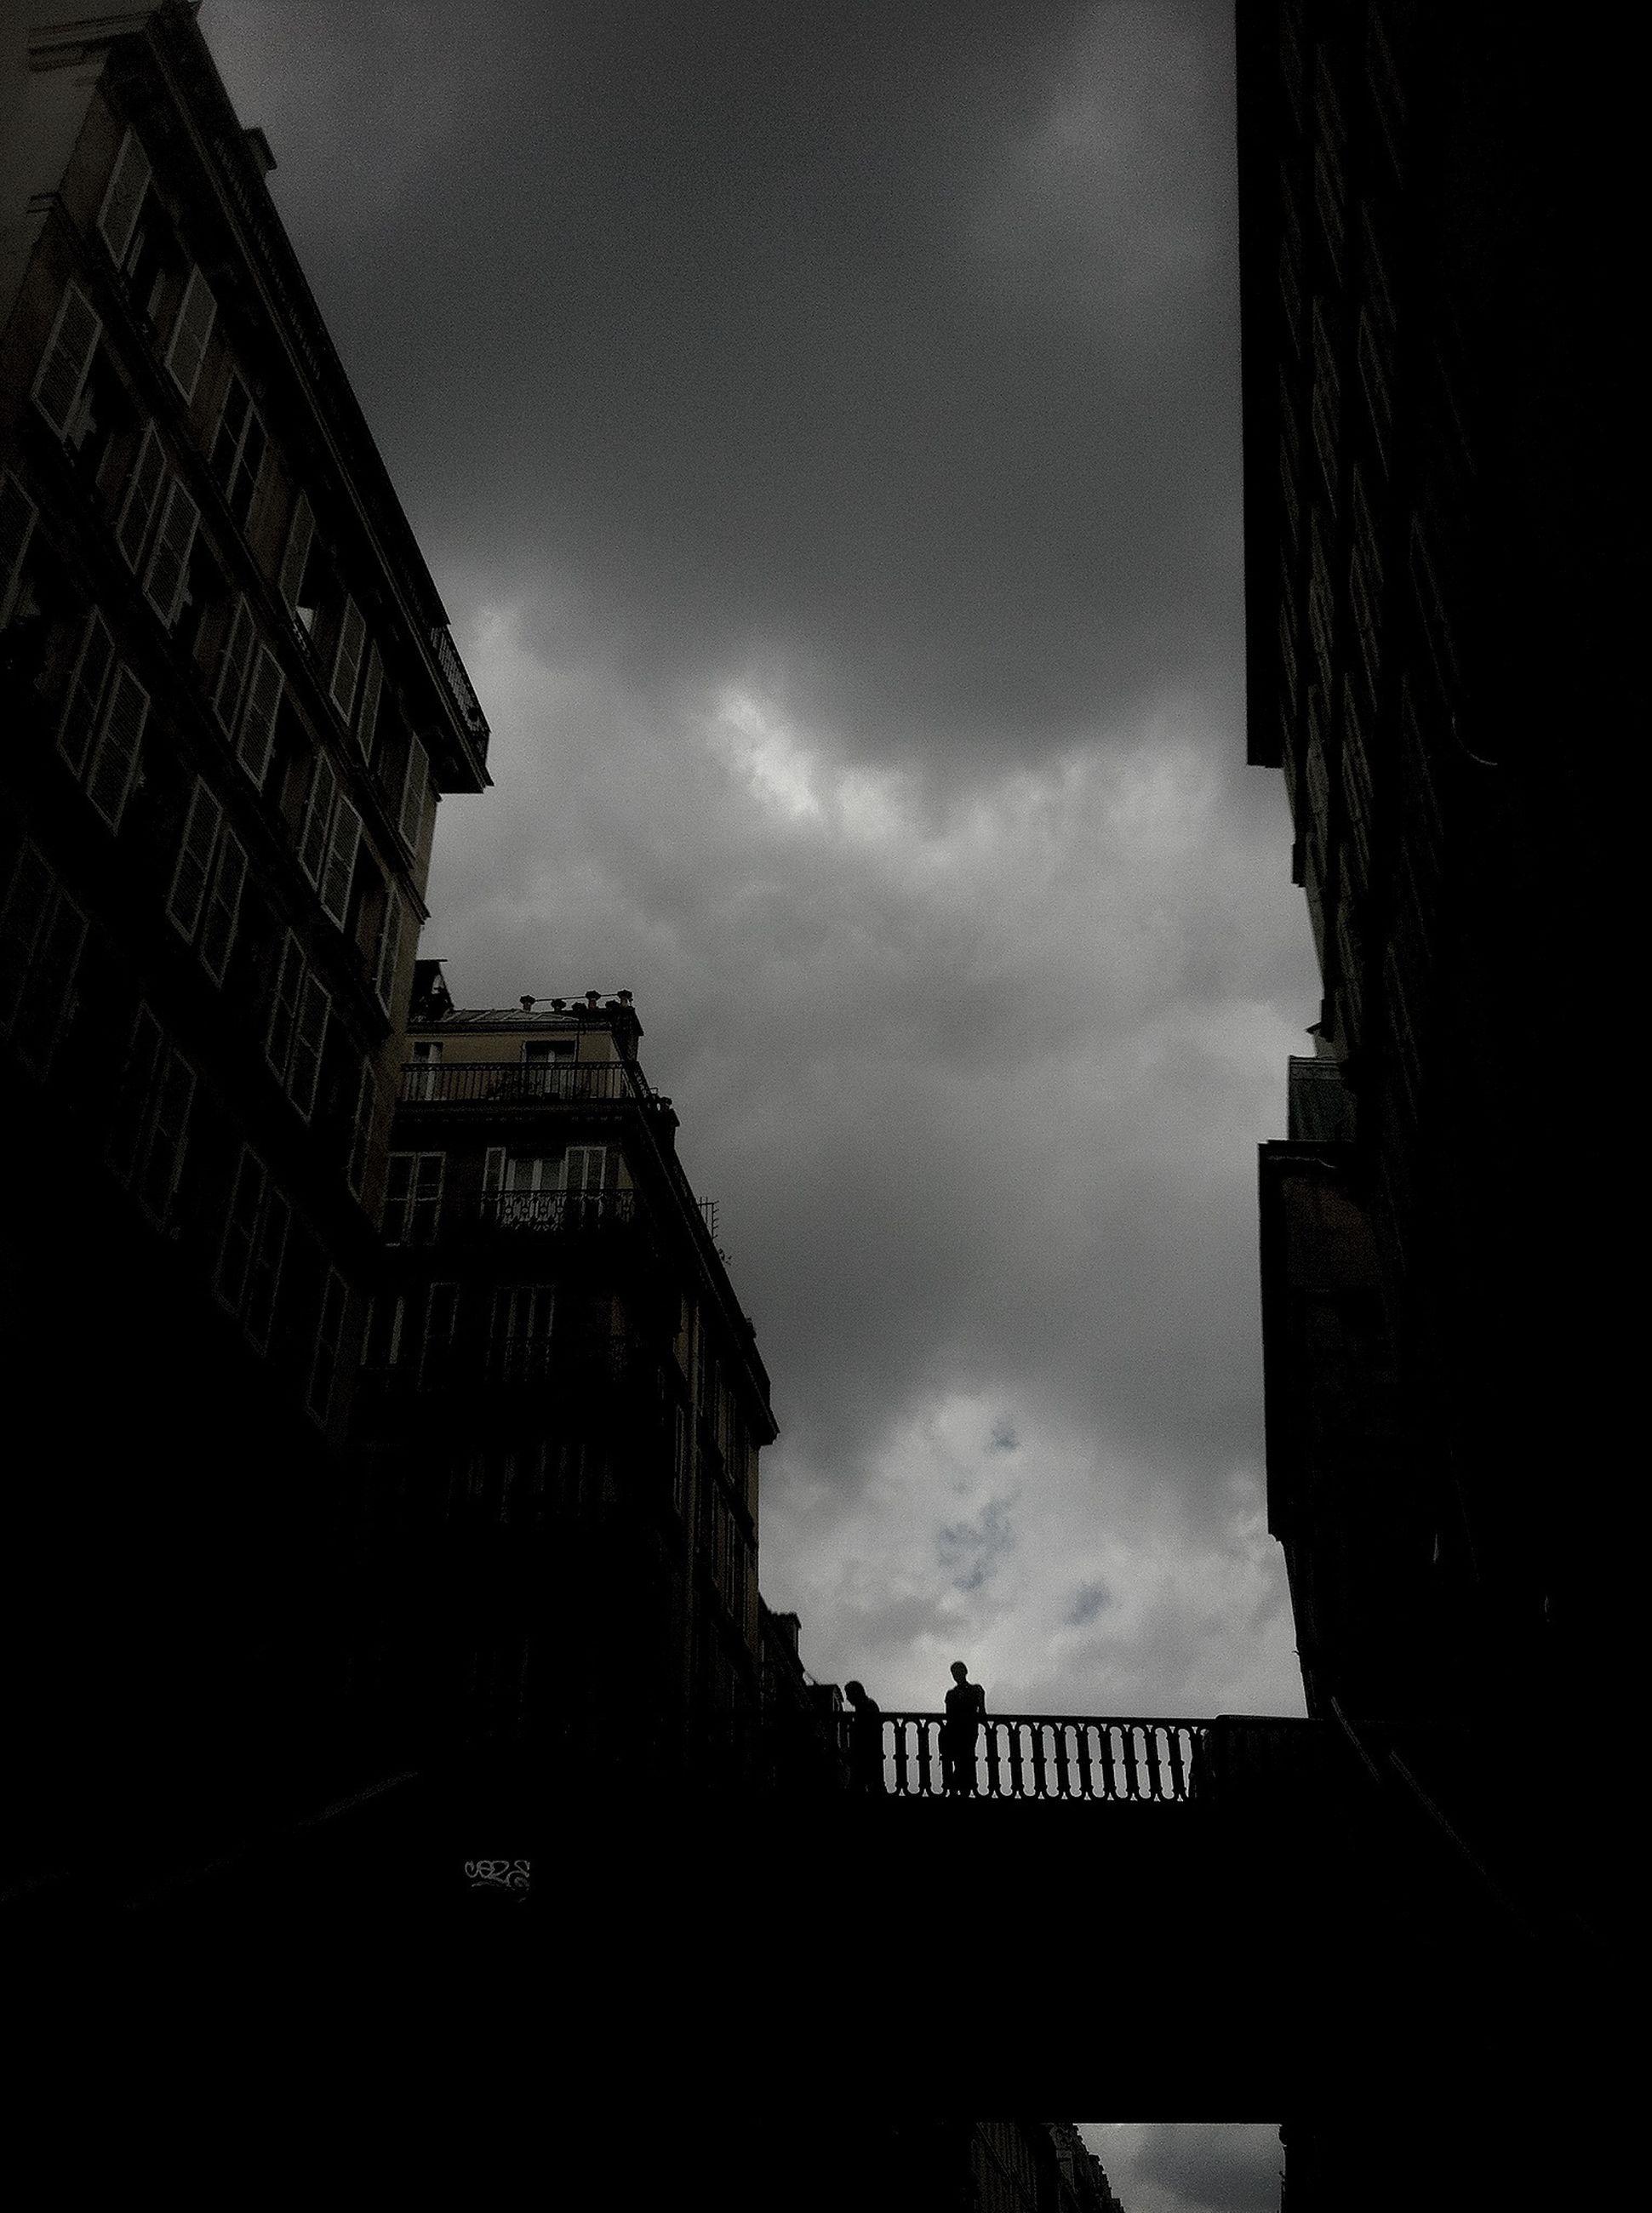 architecture, built structure, building exterior, sky, low angle view, building, cloud - sky, city, silhouette, cloudy, cloud, residential building, railing, outdoors, day, city life, dusk, residential structure